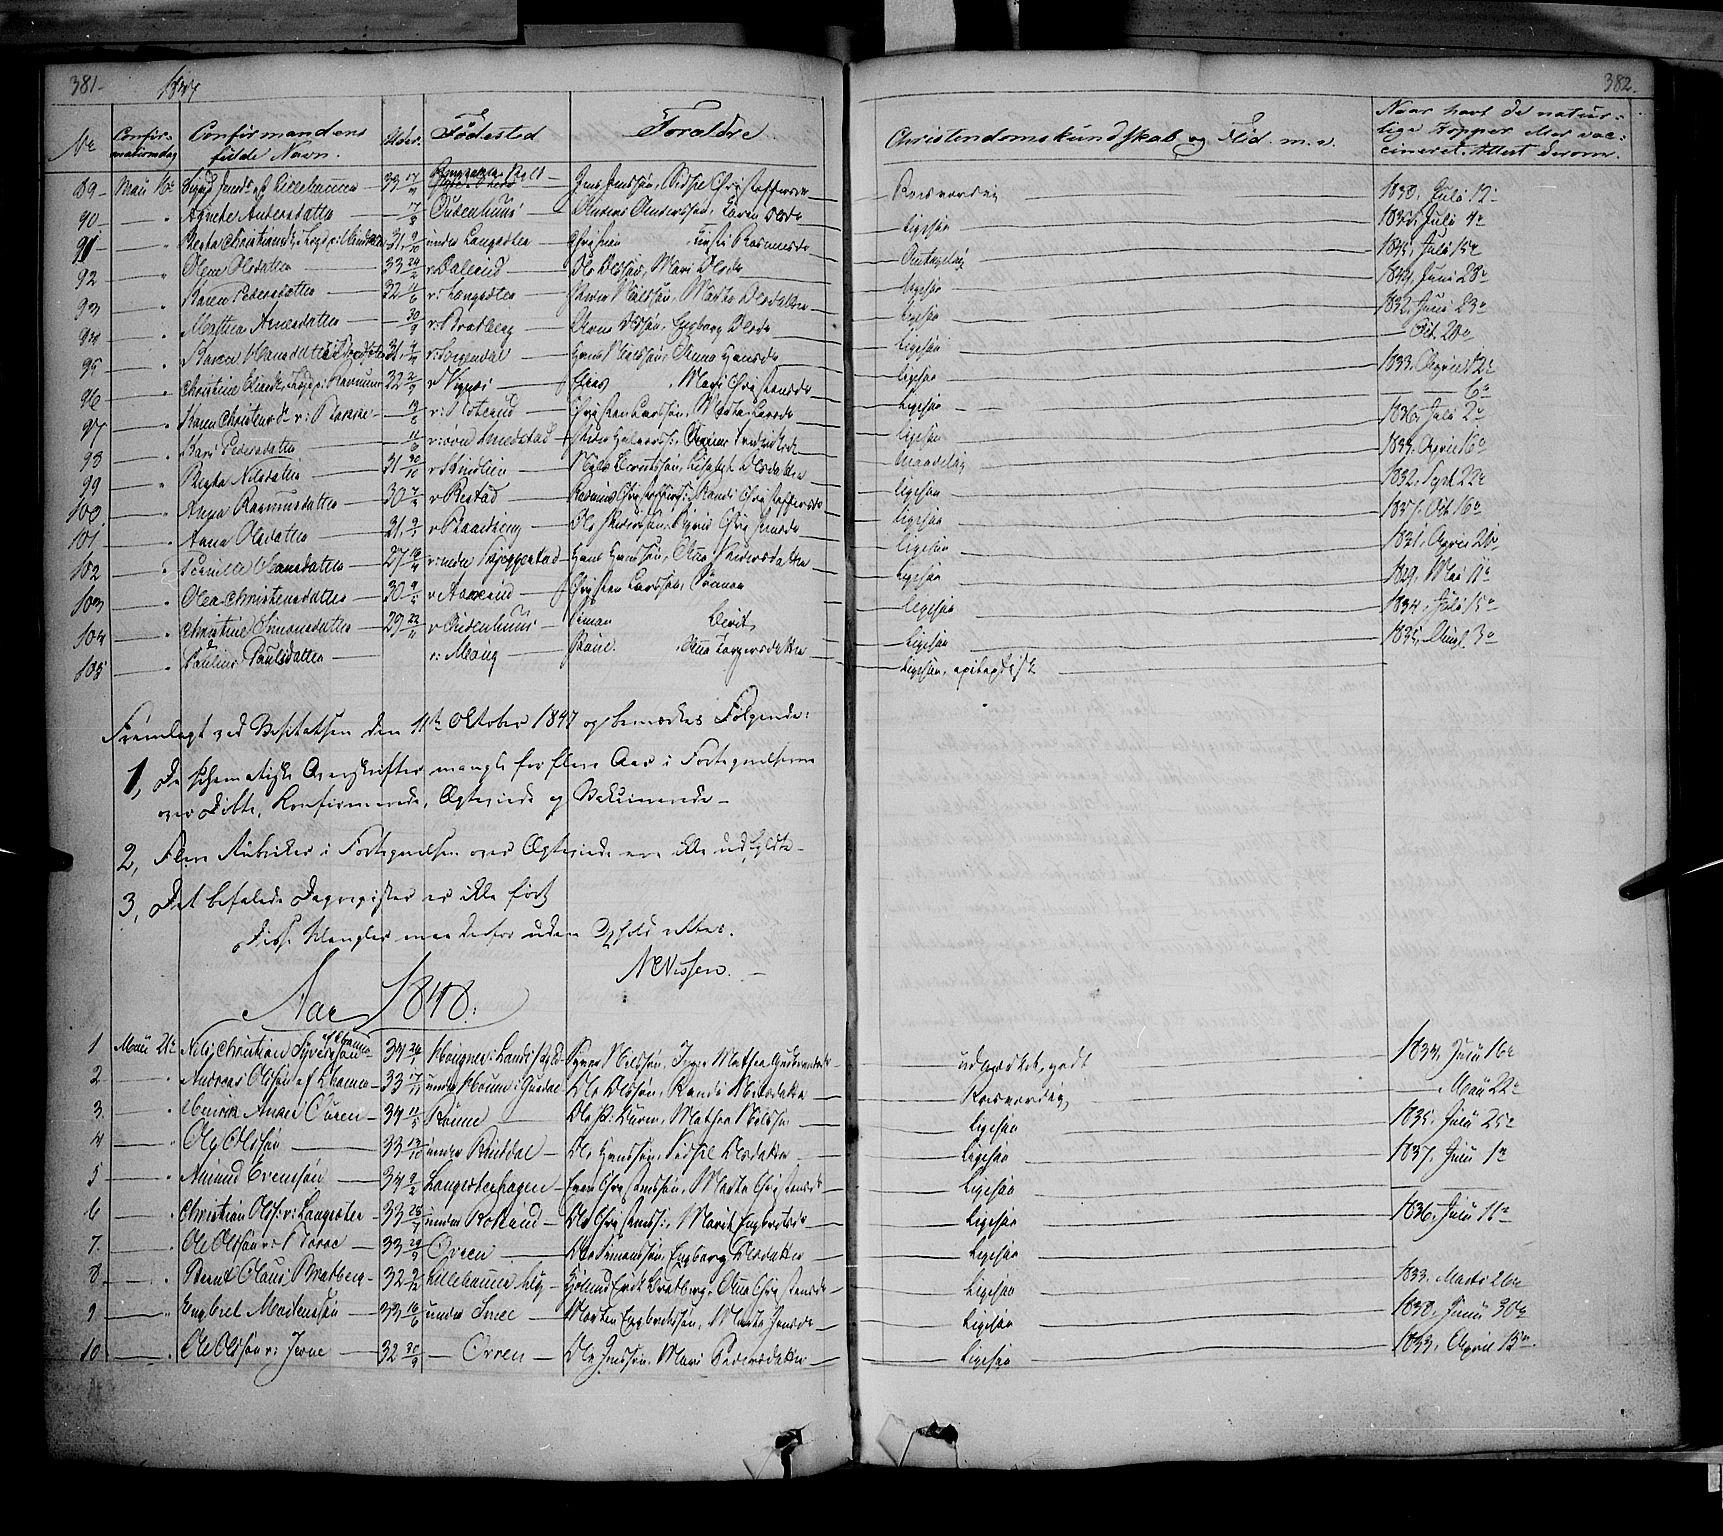 SAH, Fåberg prestekontor, Ministerialbok nr. 5, 1836-1854, s. 381-382